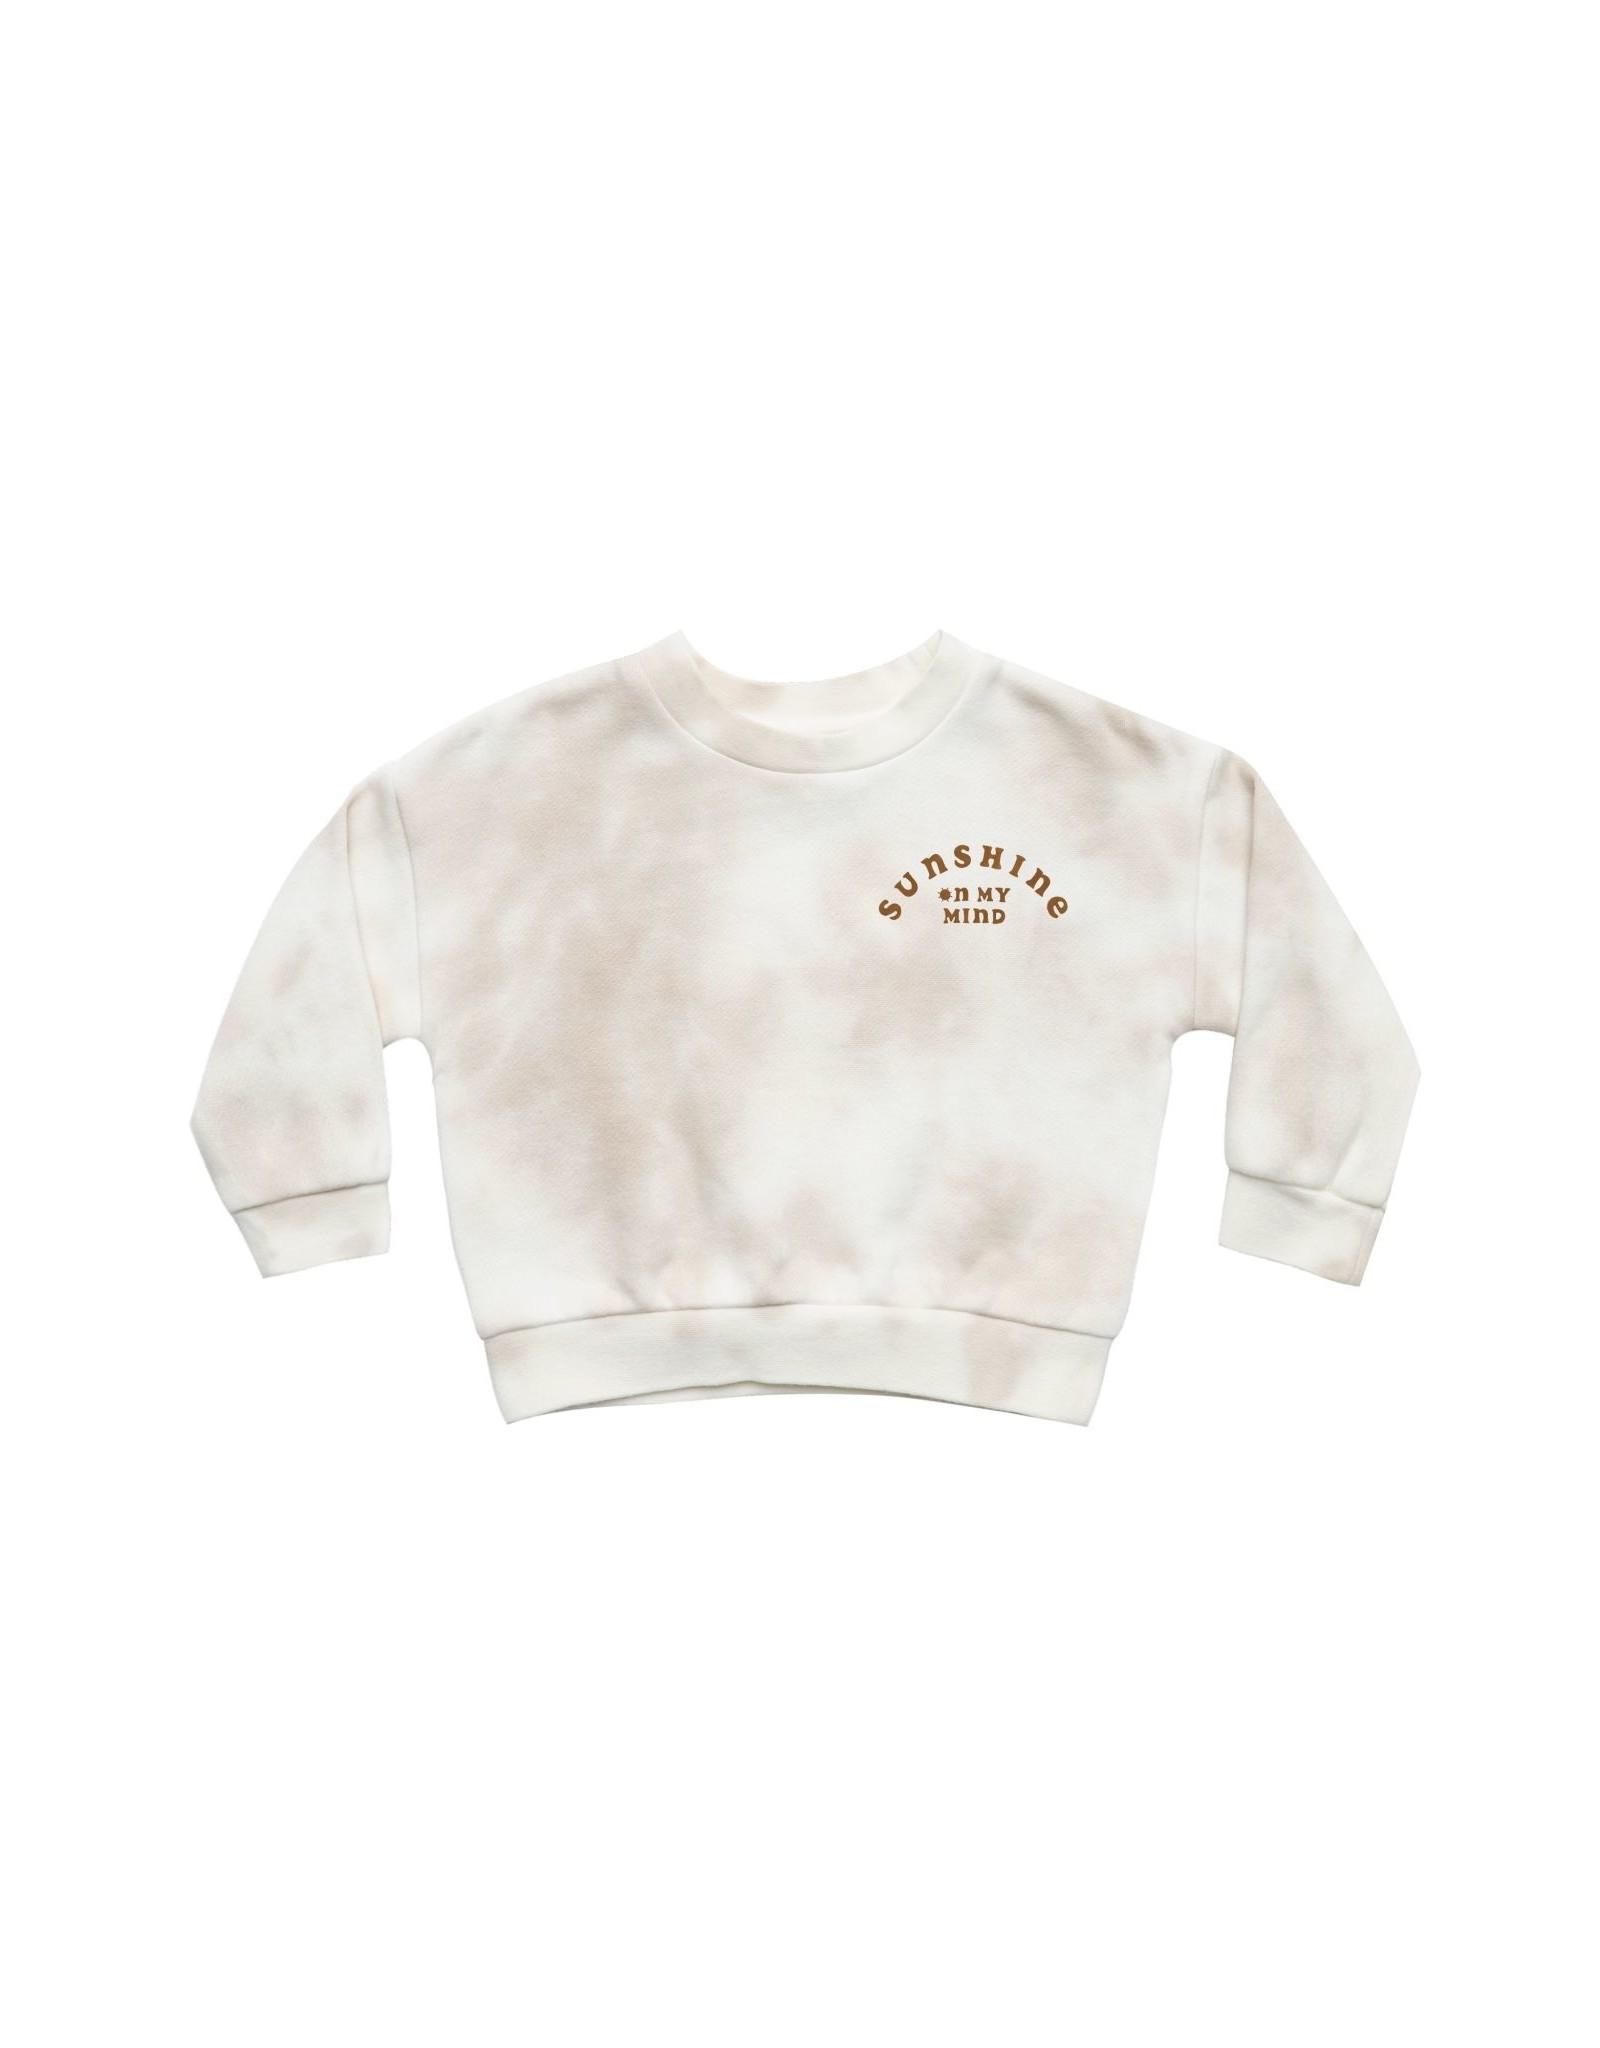 Rylee & Cru Rylee & Cru Tie Dye Fleece Sweatshirt